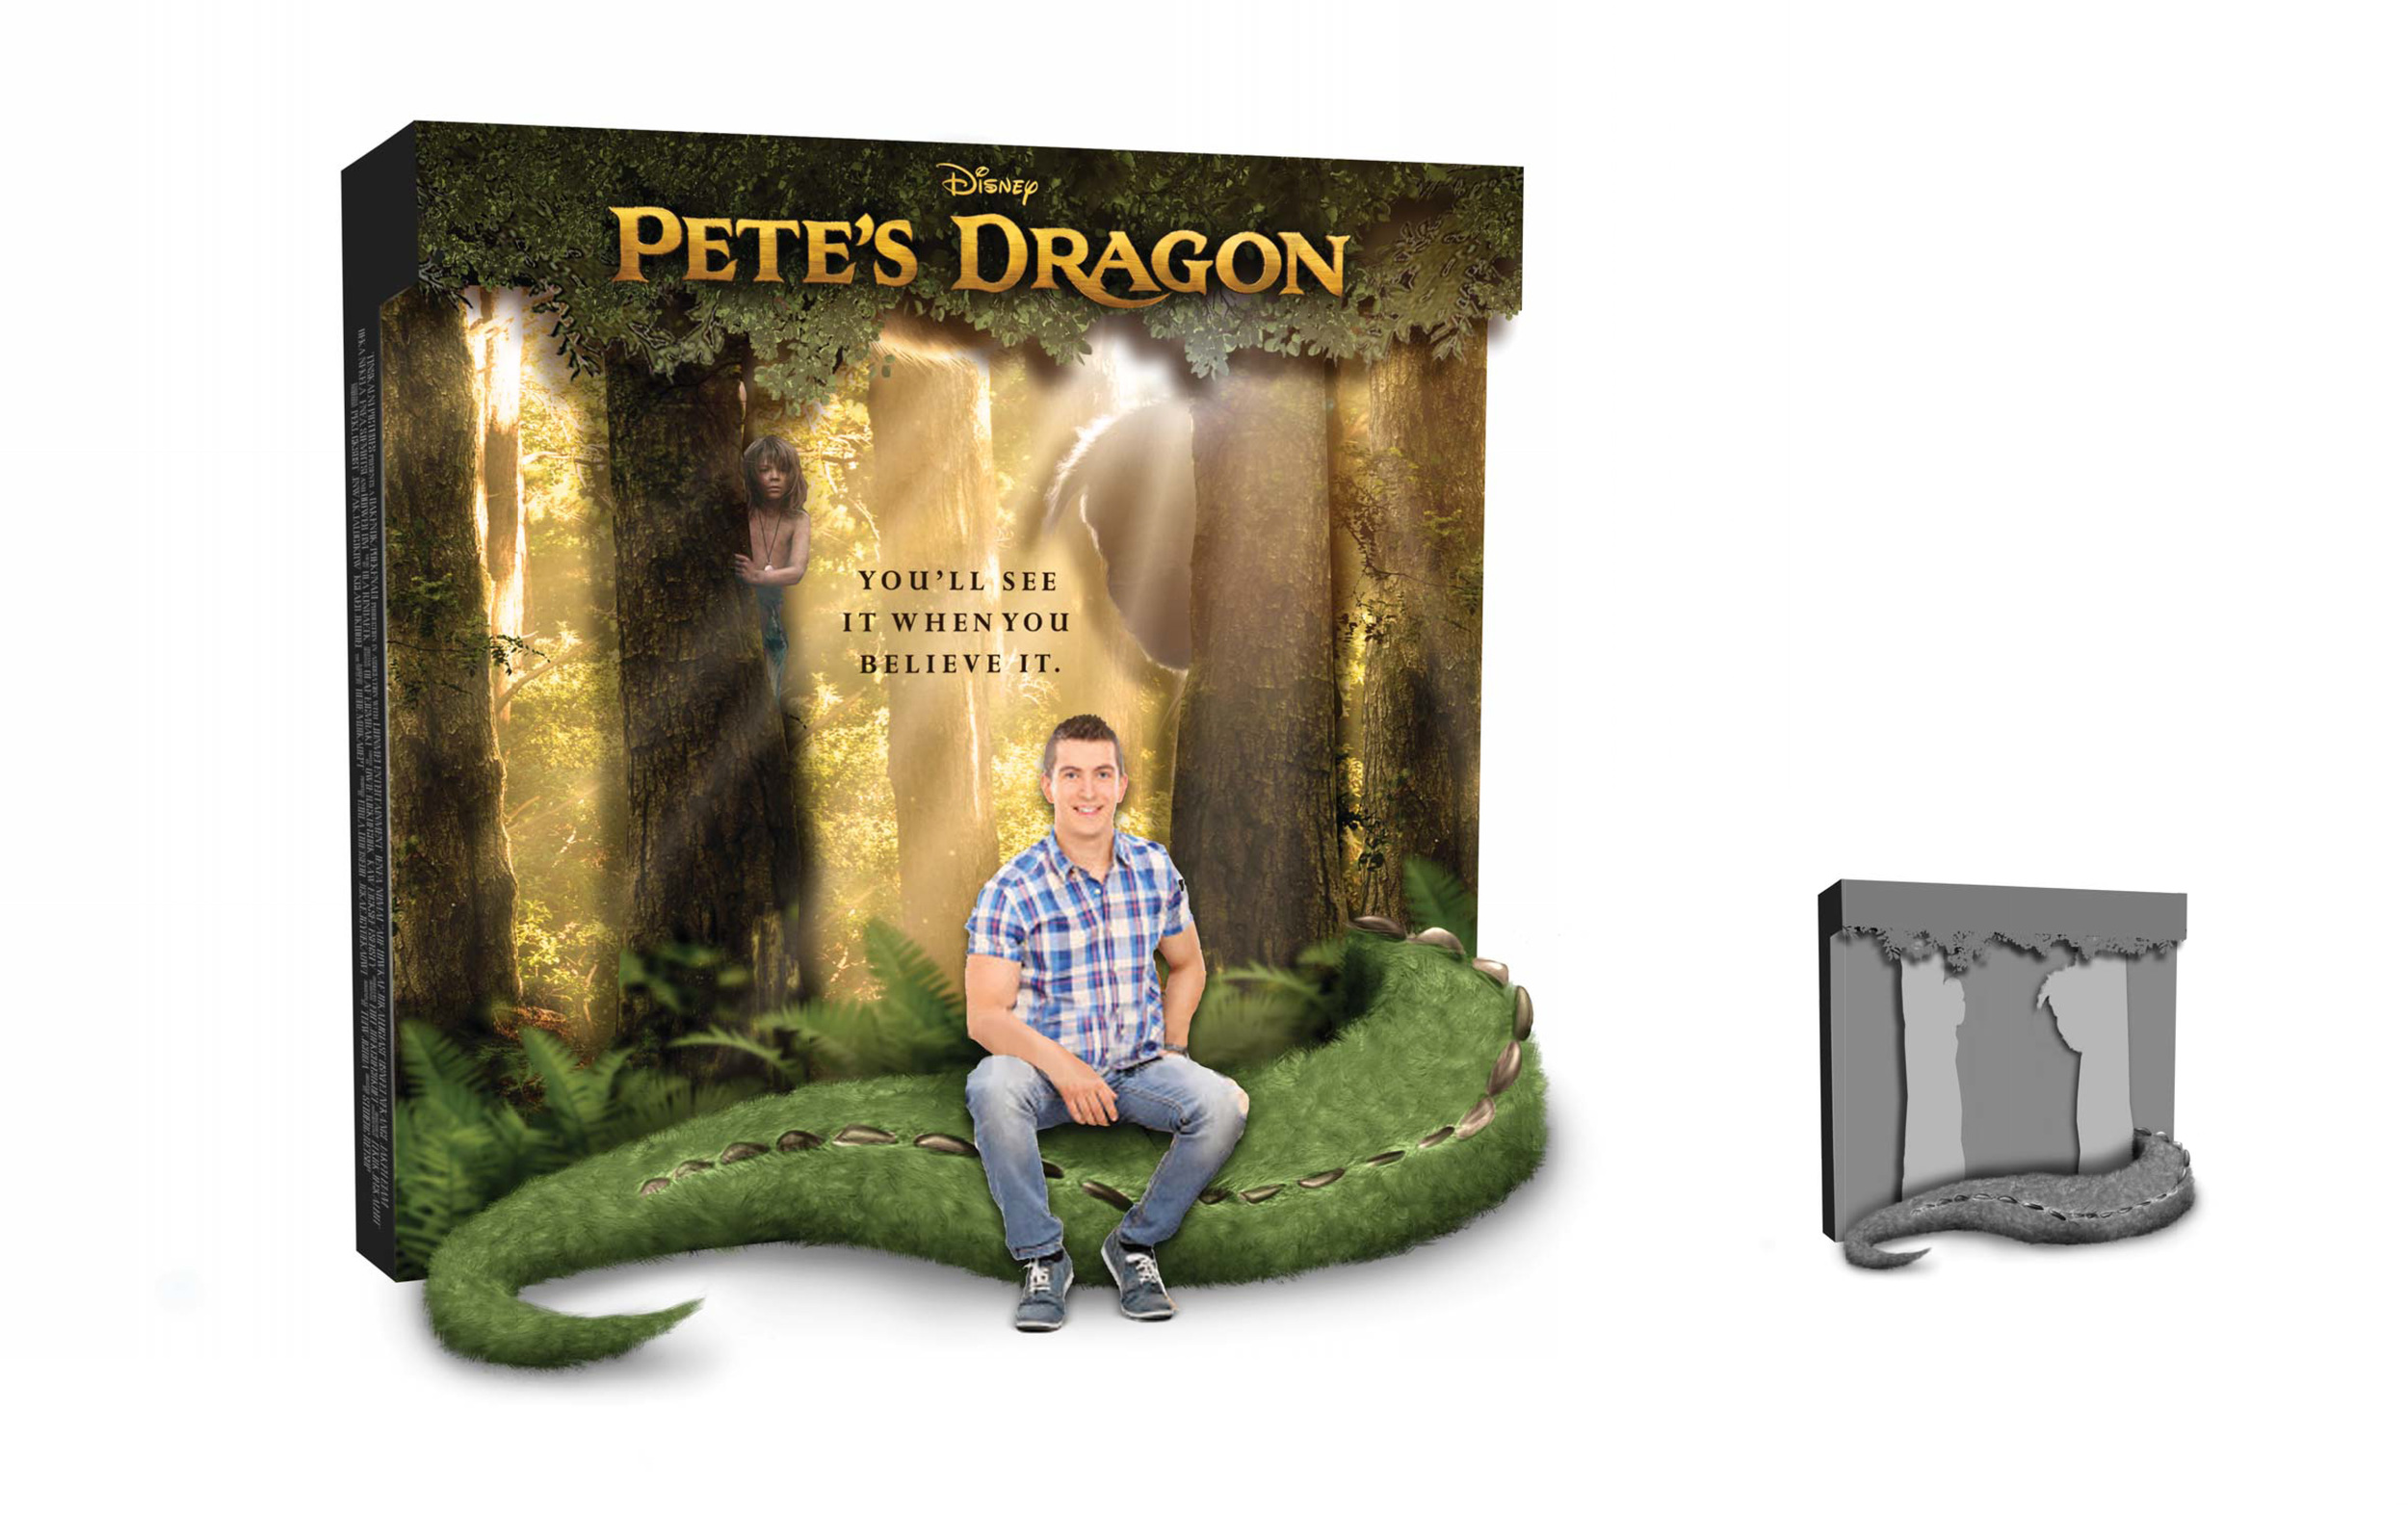 PetesDragon_Standee_2R1.jpg